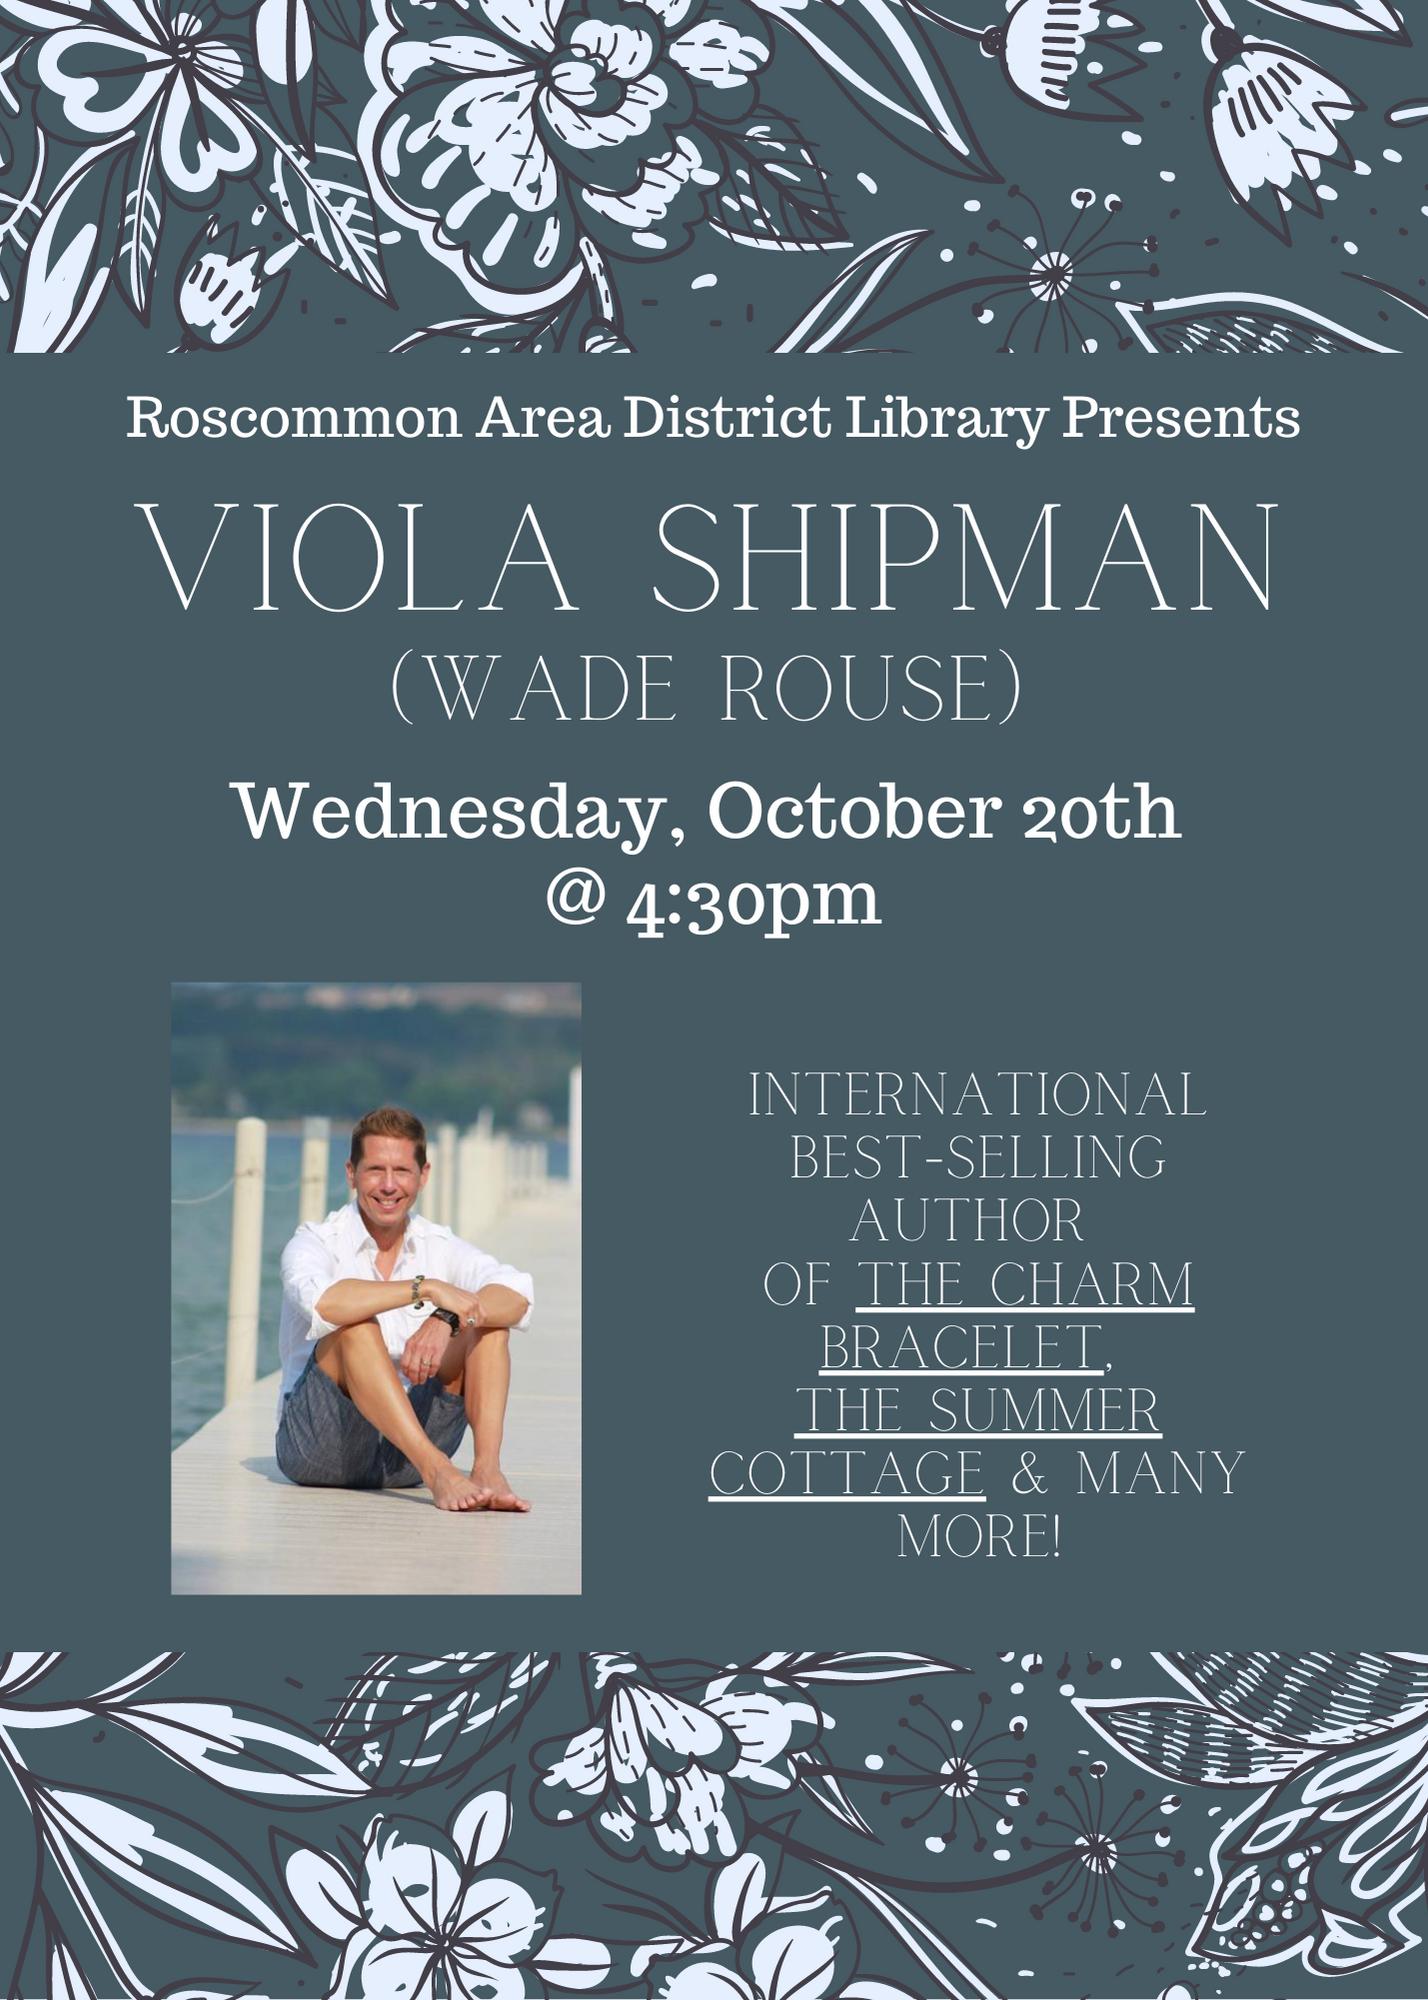 small viola shipman